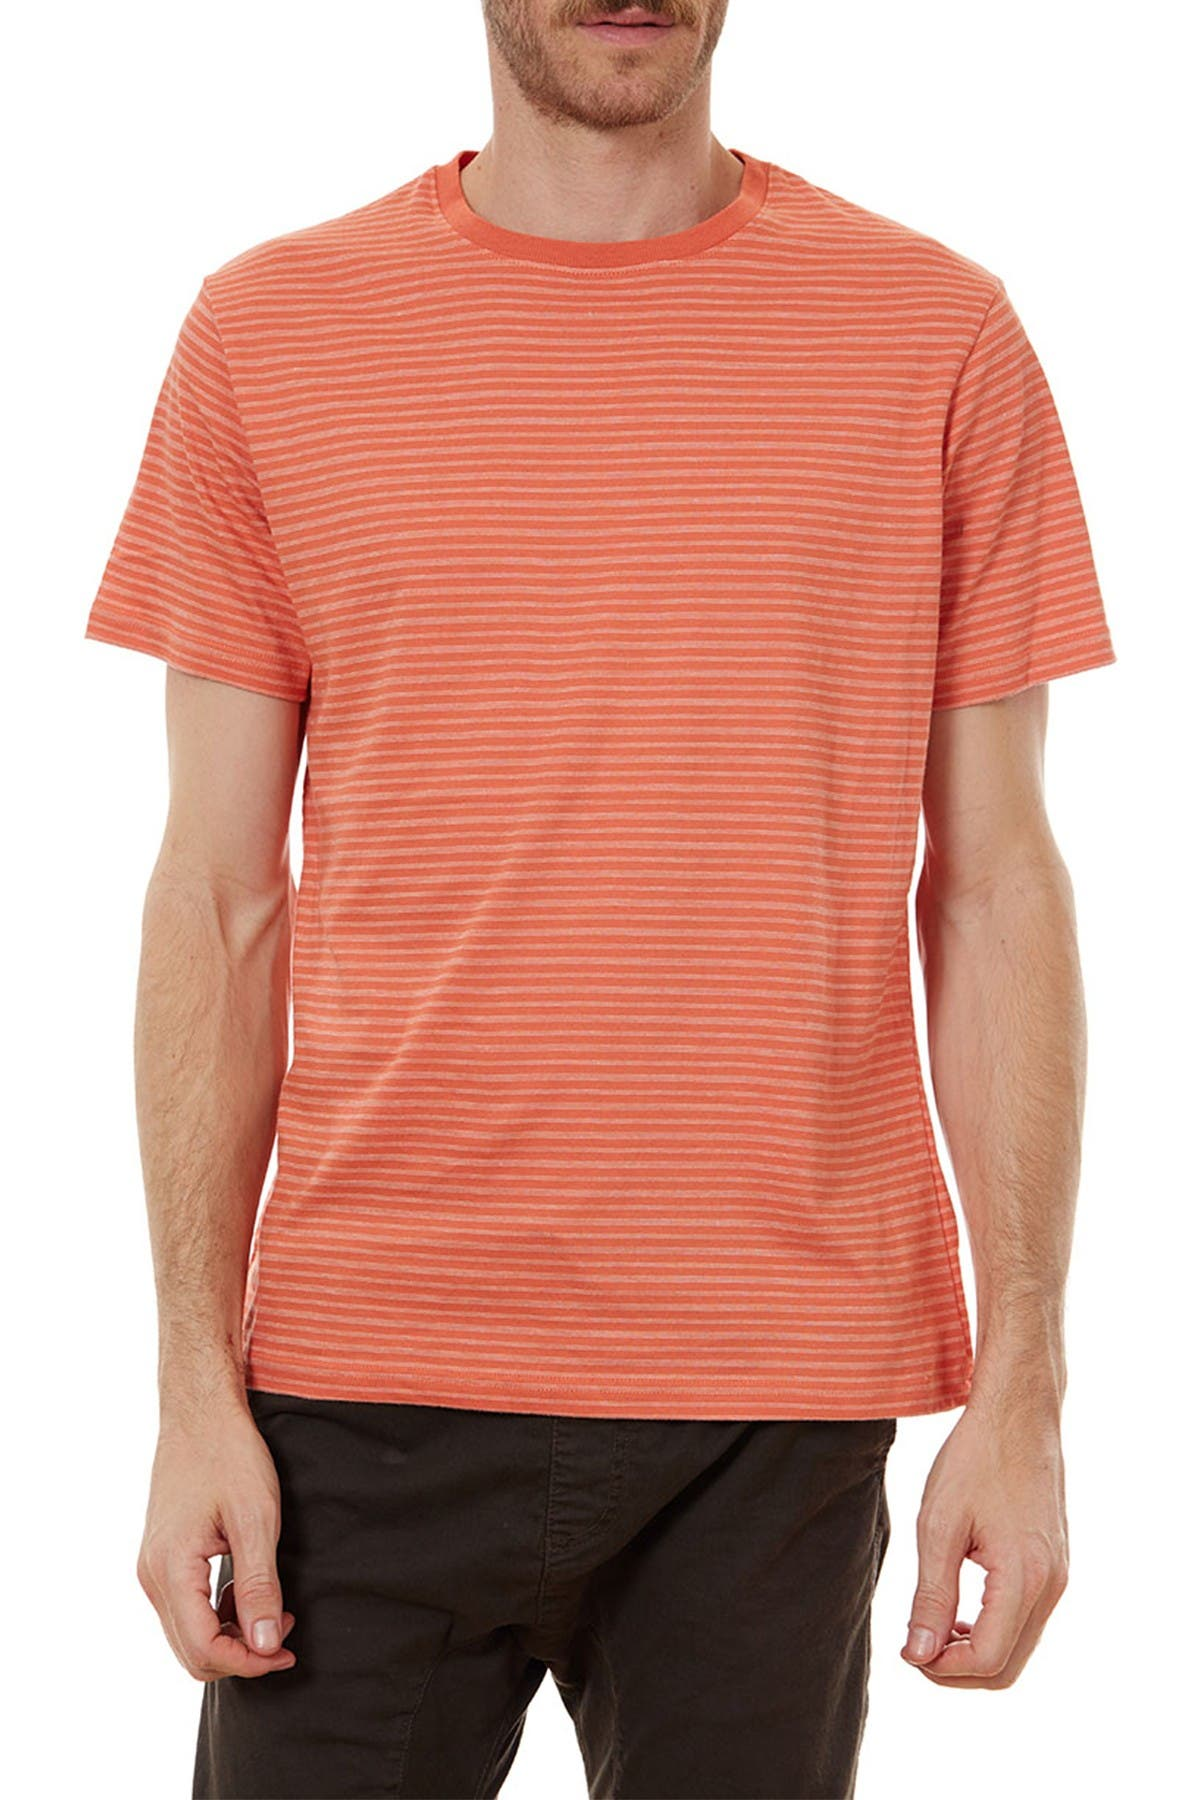 Image of PX Thin Stripe Crew Neck T-Shirt